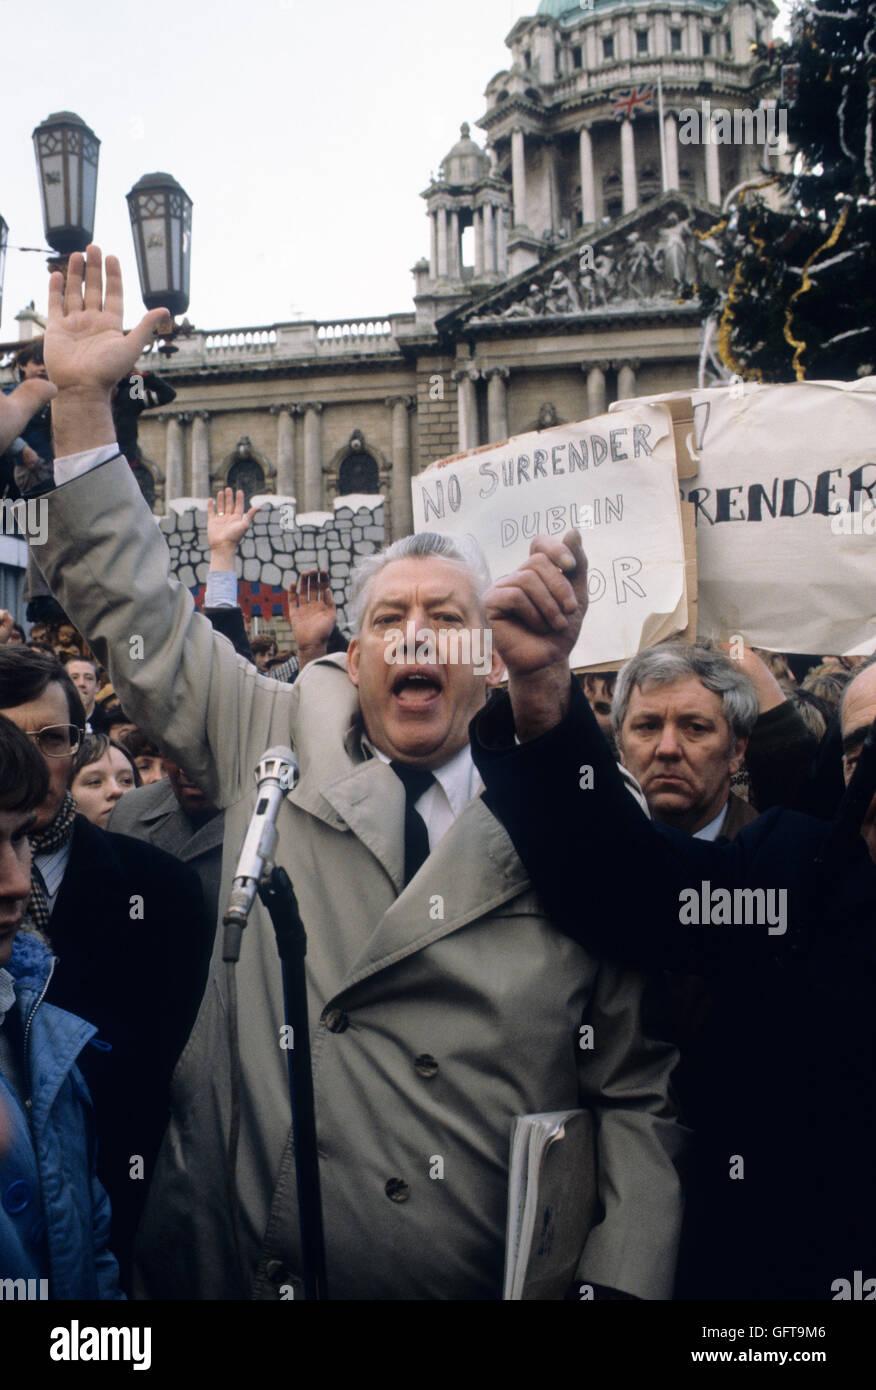 Rev 'Ian Paisley' 'Irlanda del Norte' 'No Surrender' banners. 1981 Homero SYKES Imagen De Stock